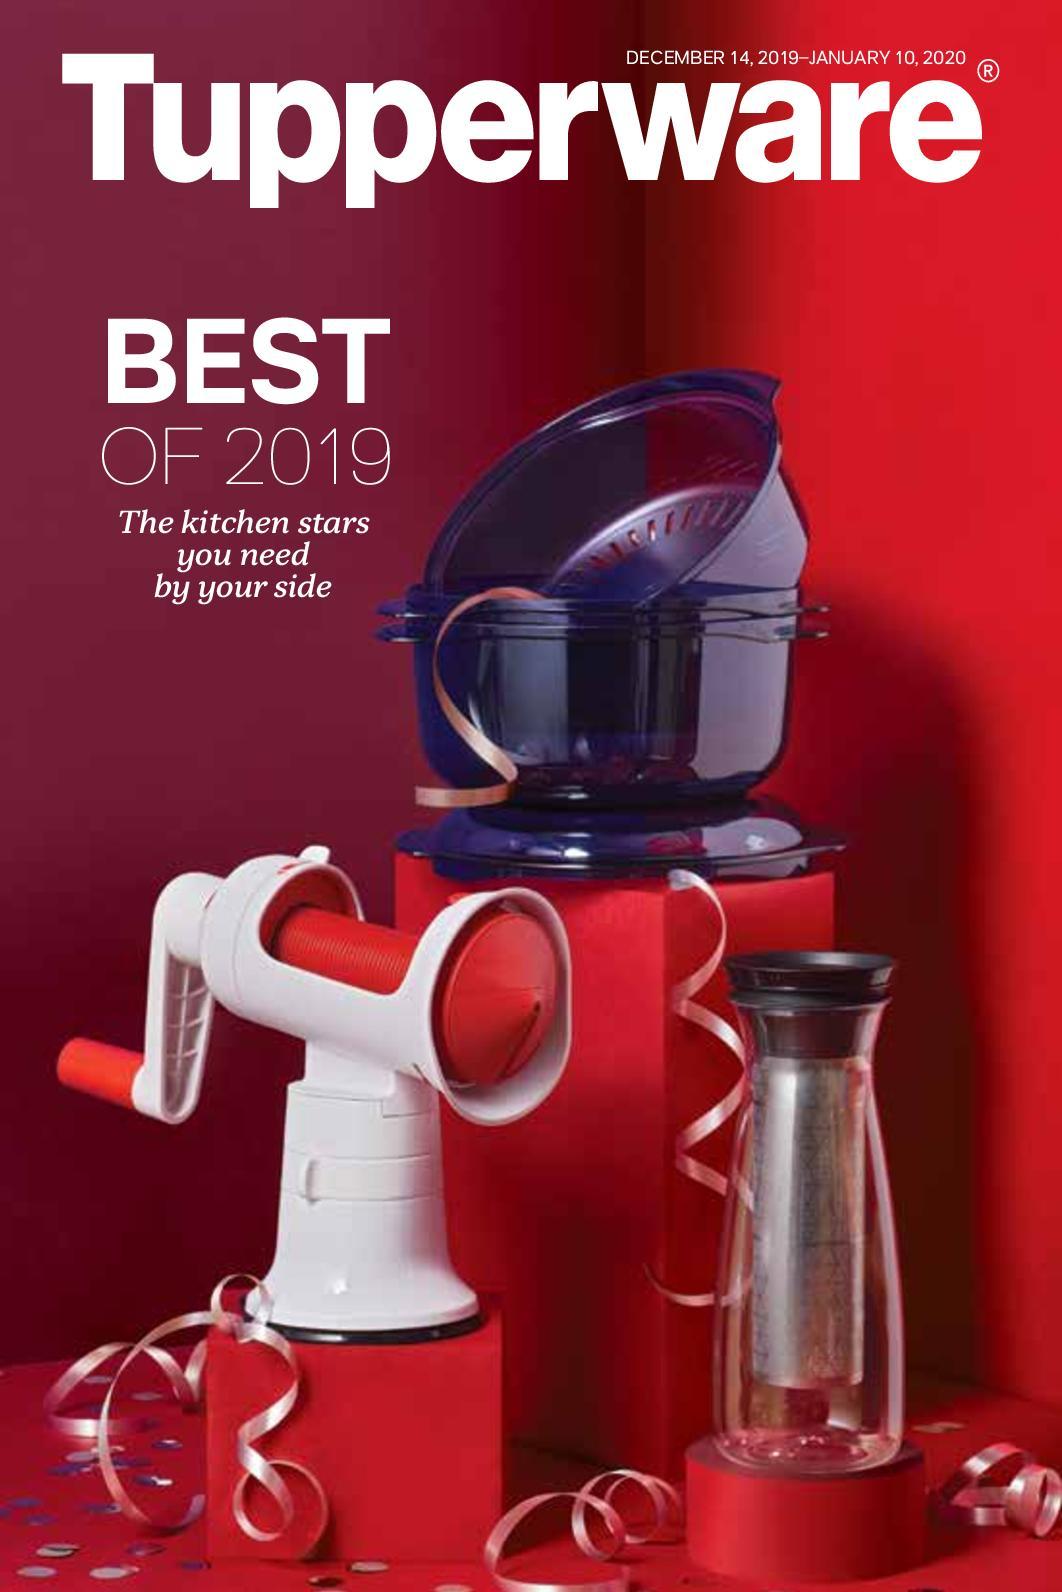 Calaméo  Mid December 2019 Brochure Us intended for Tupperware Januar Specials 2020